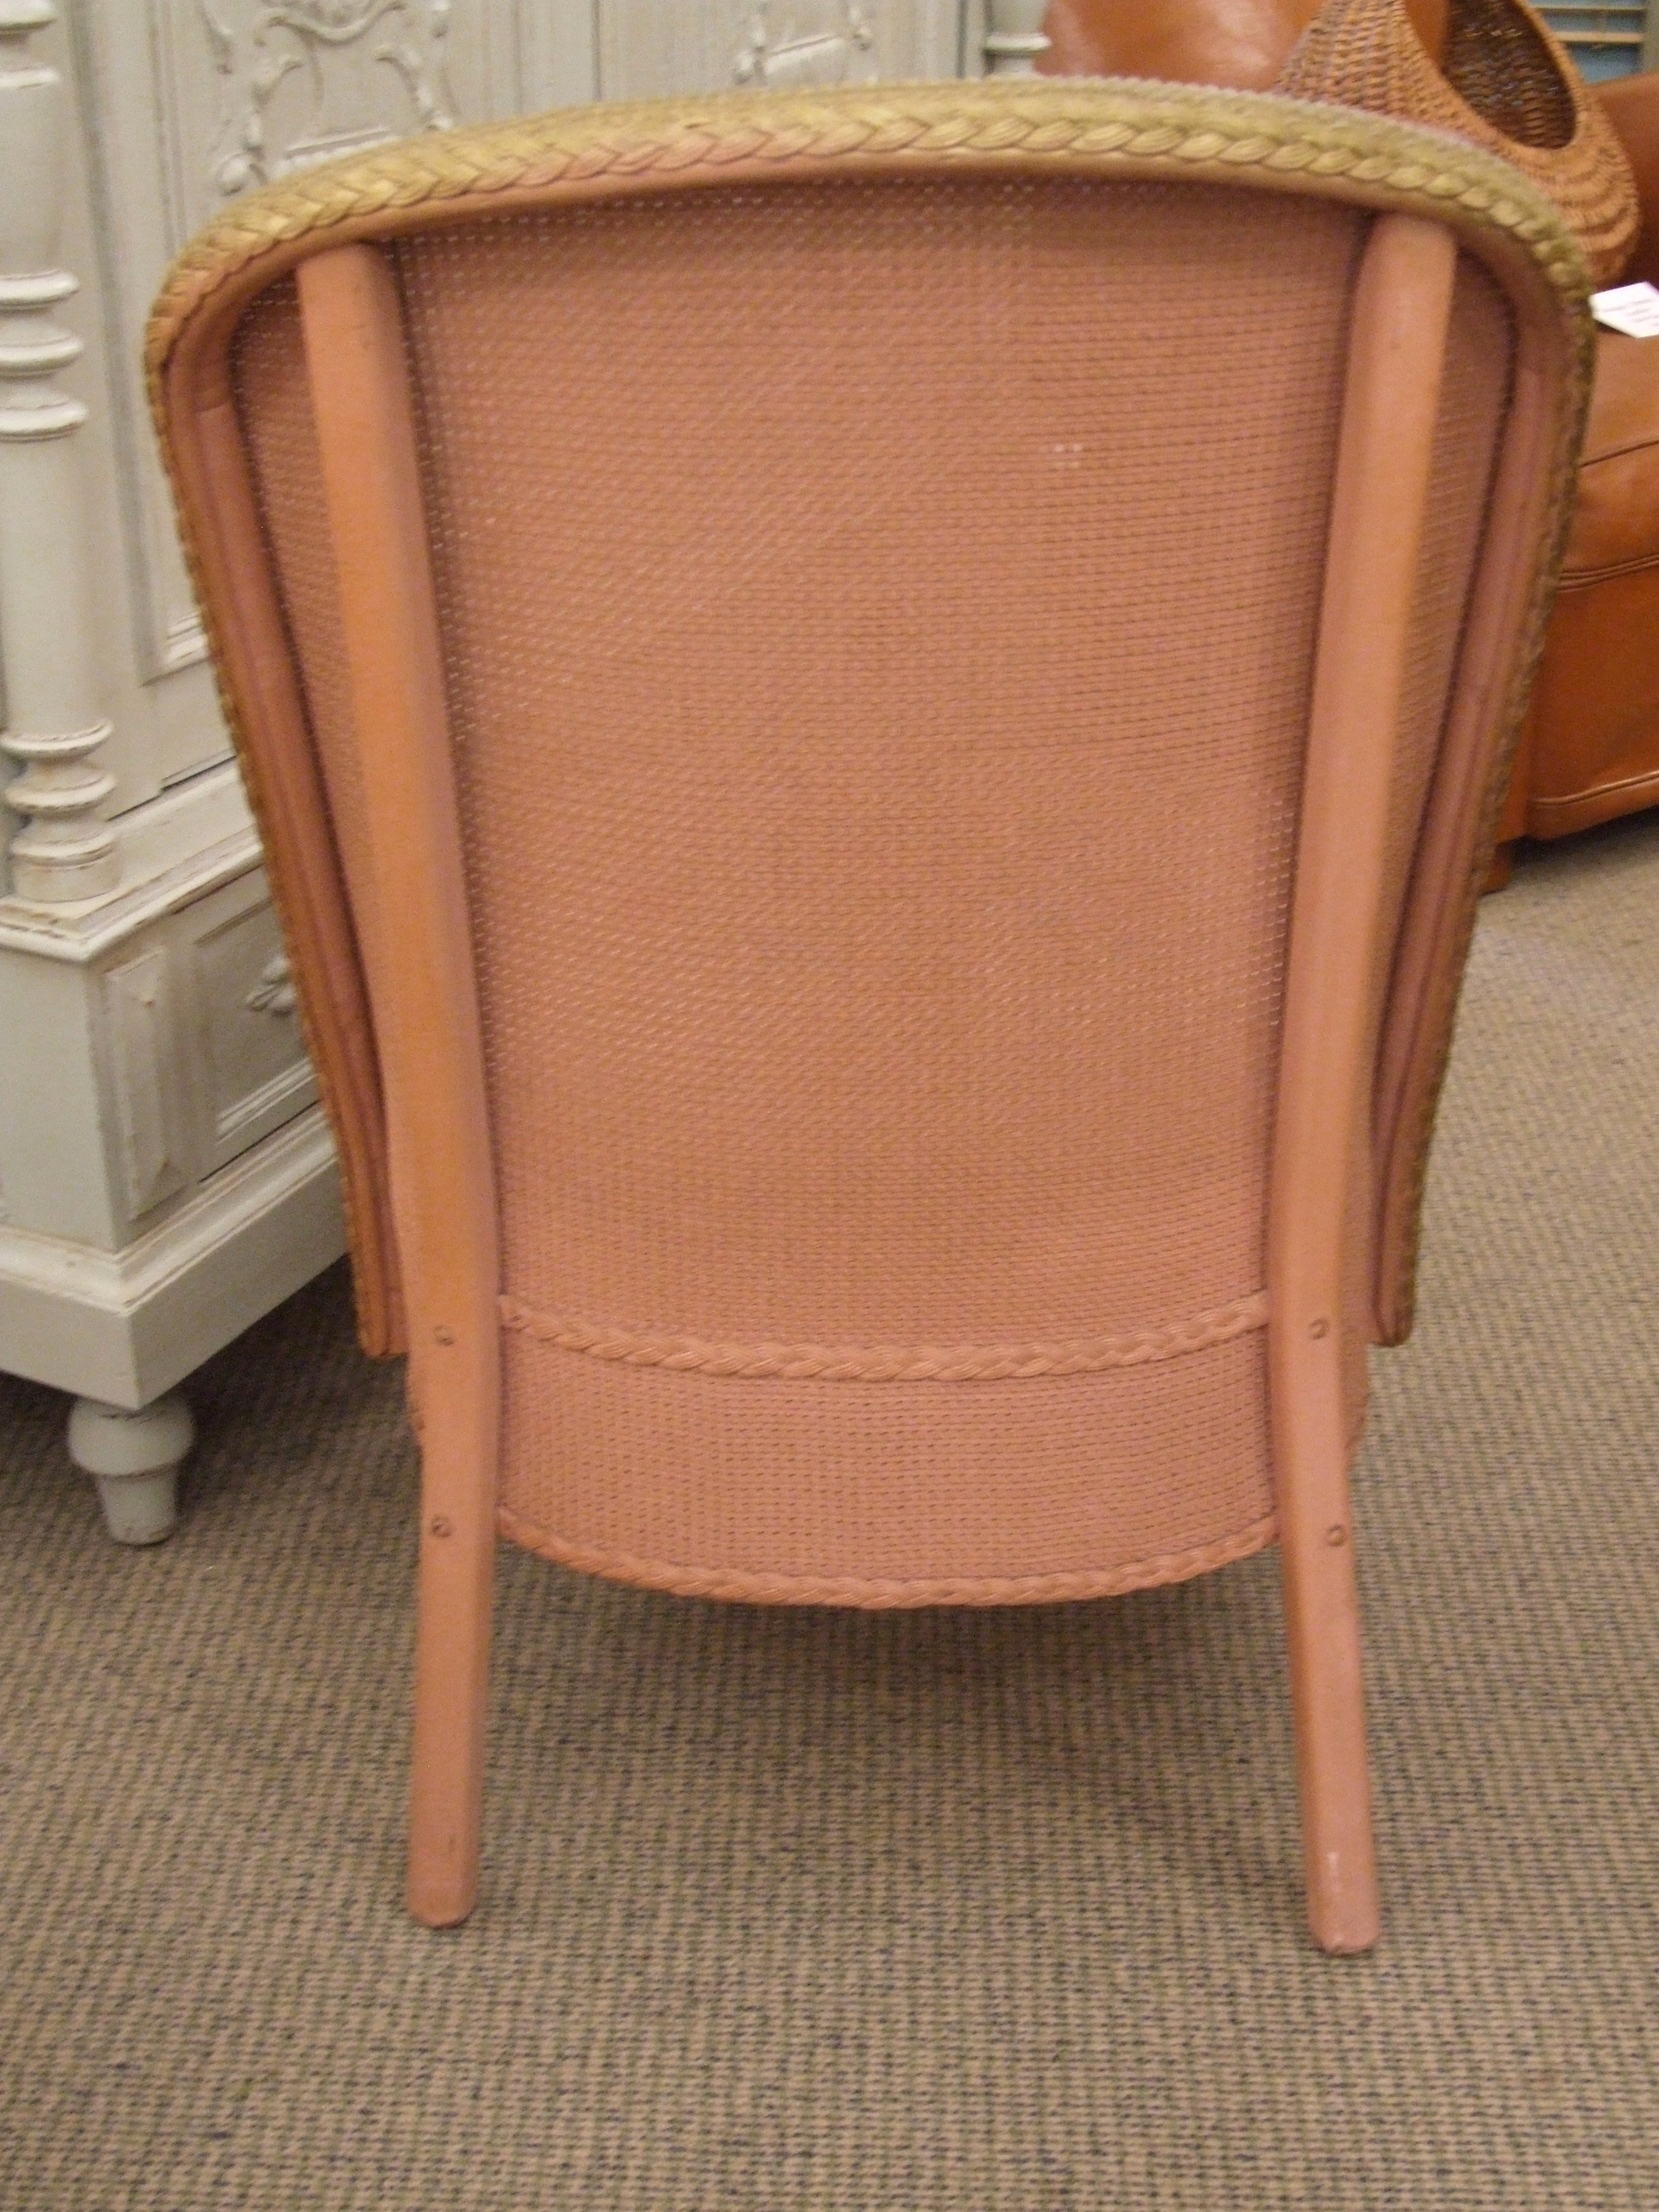 vintage pink bedroom chair and ottoman set c1950 la belle toffe